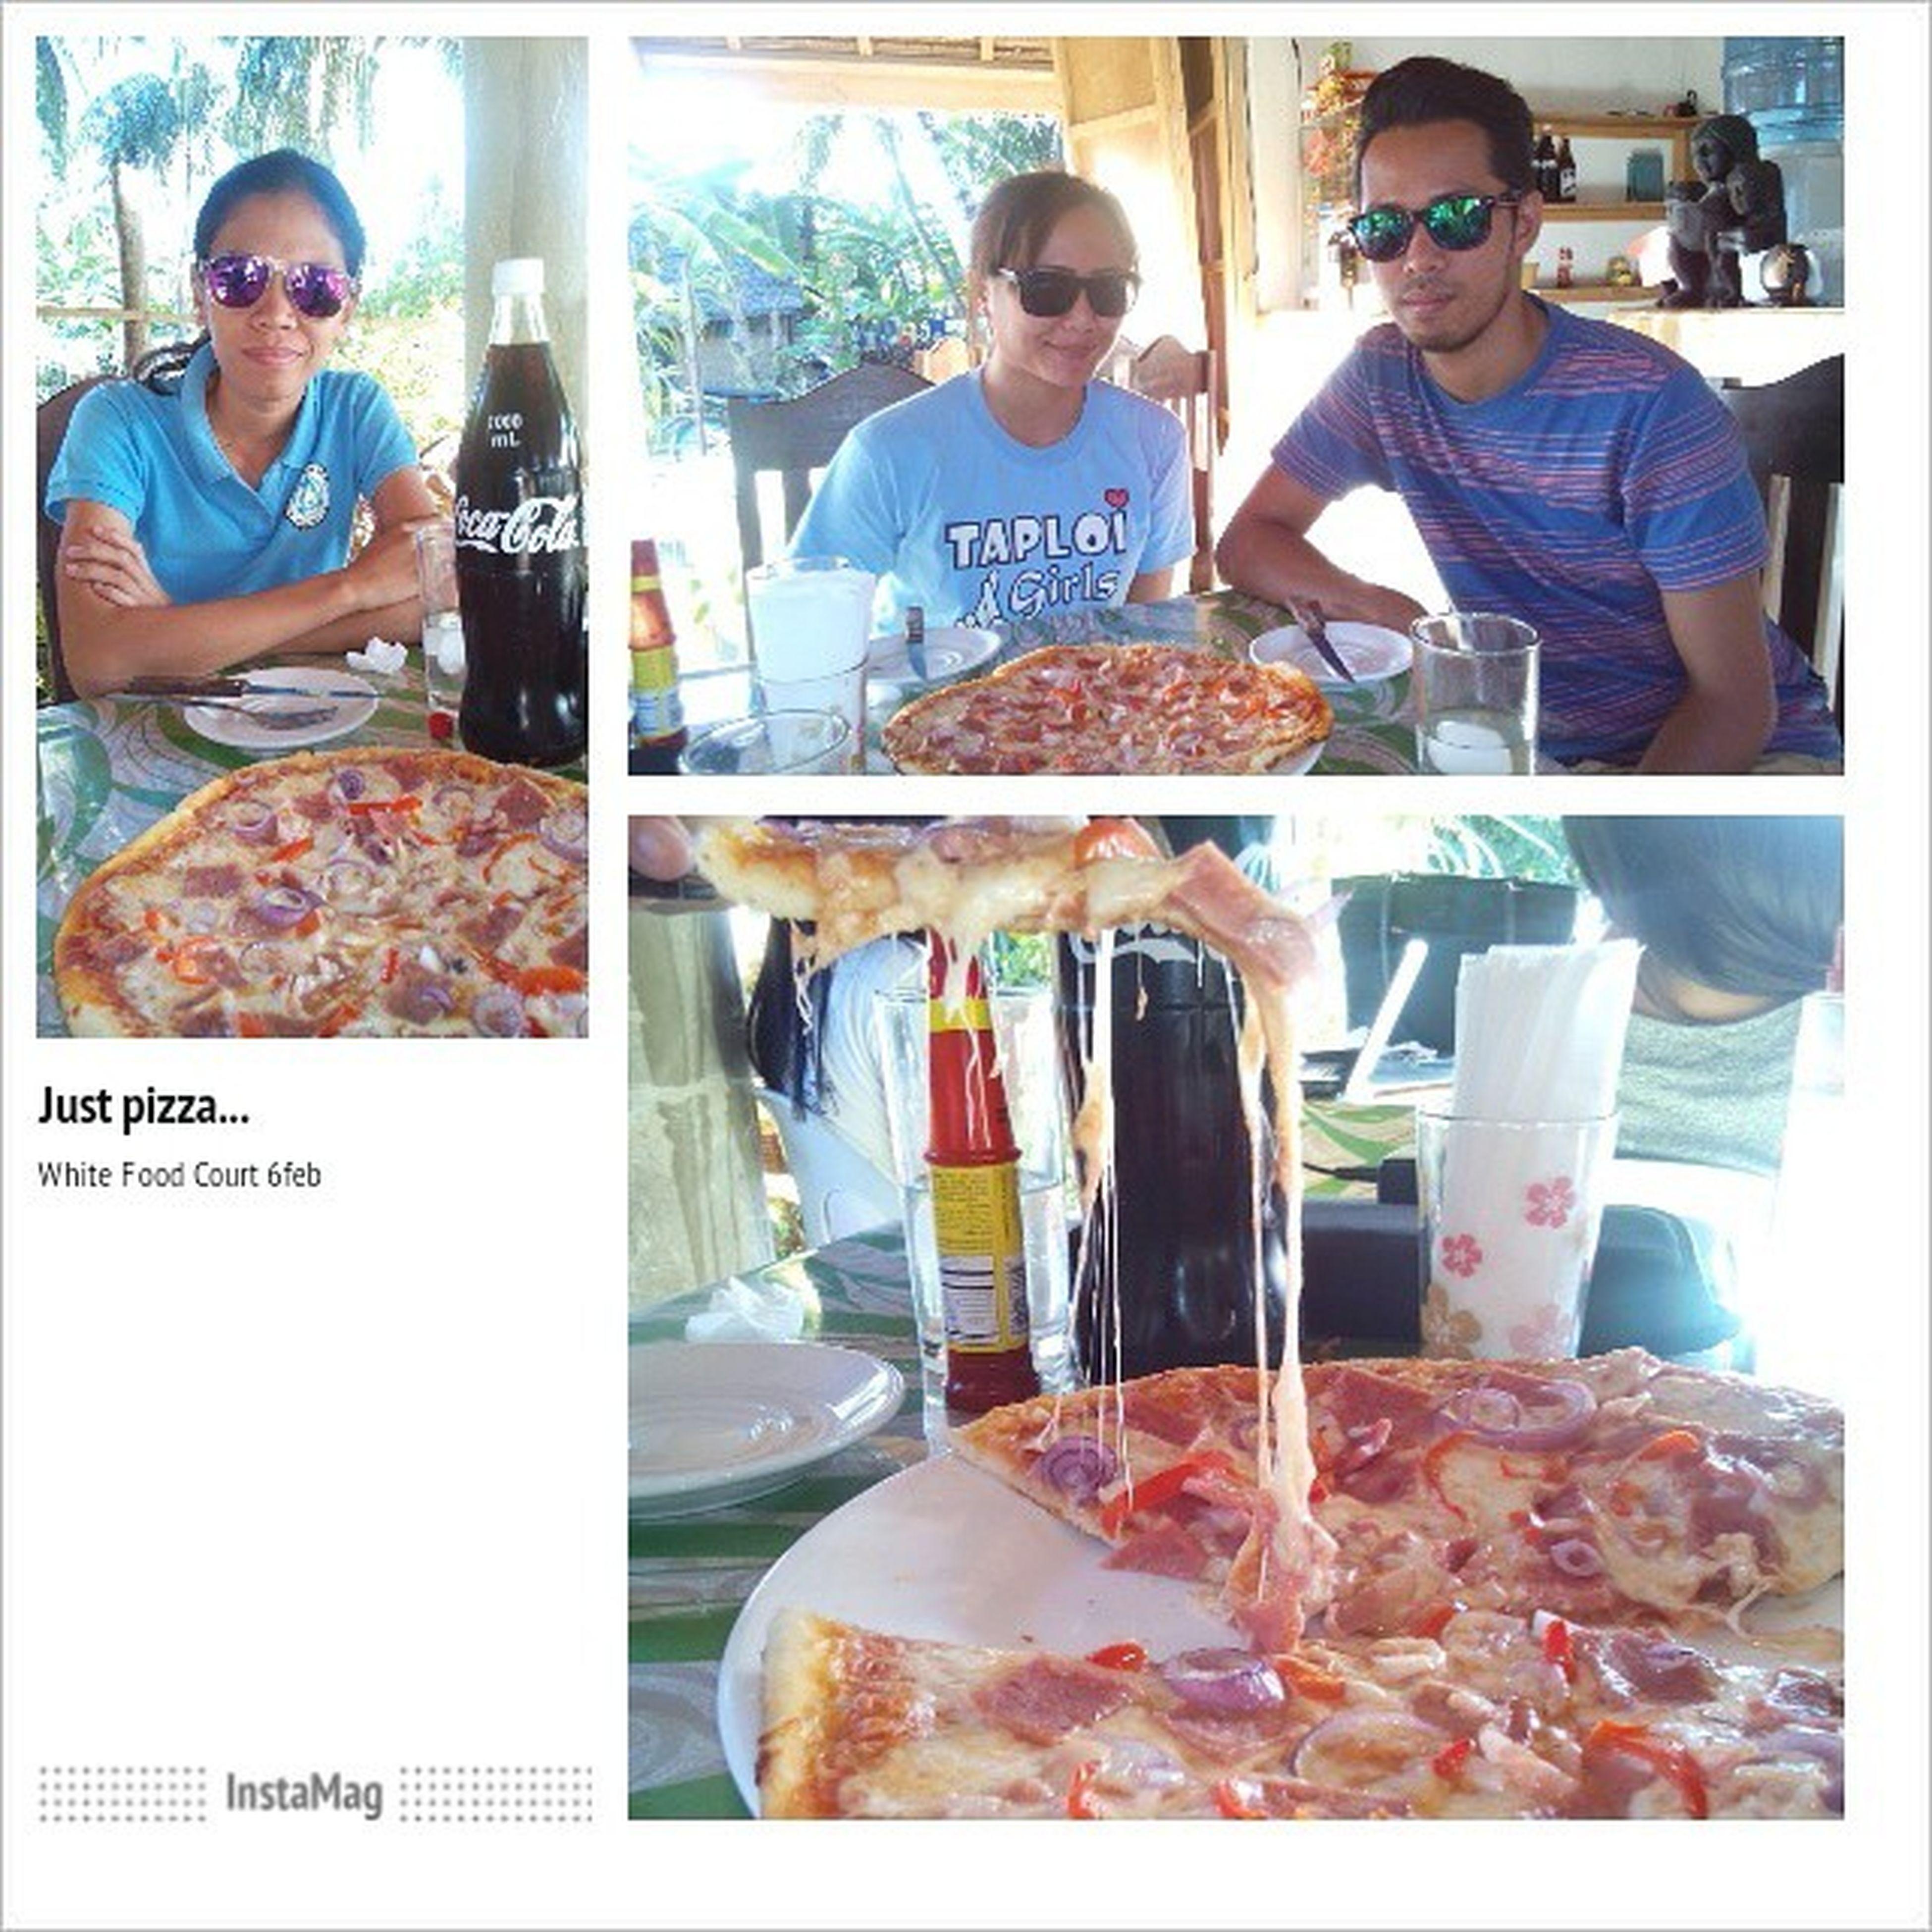 Pizza for the jobless. Poor us 3. Pizza Whitefoodcourt Instagram Sanjuan siquijorisland InstaMagAndroid 6feb